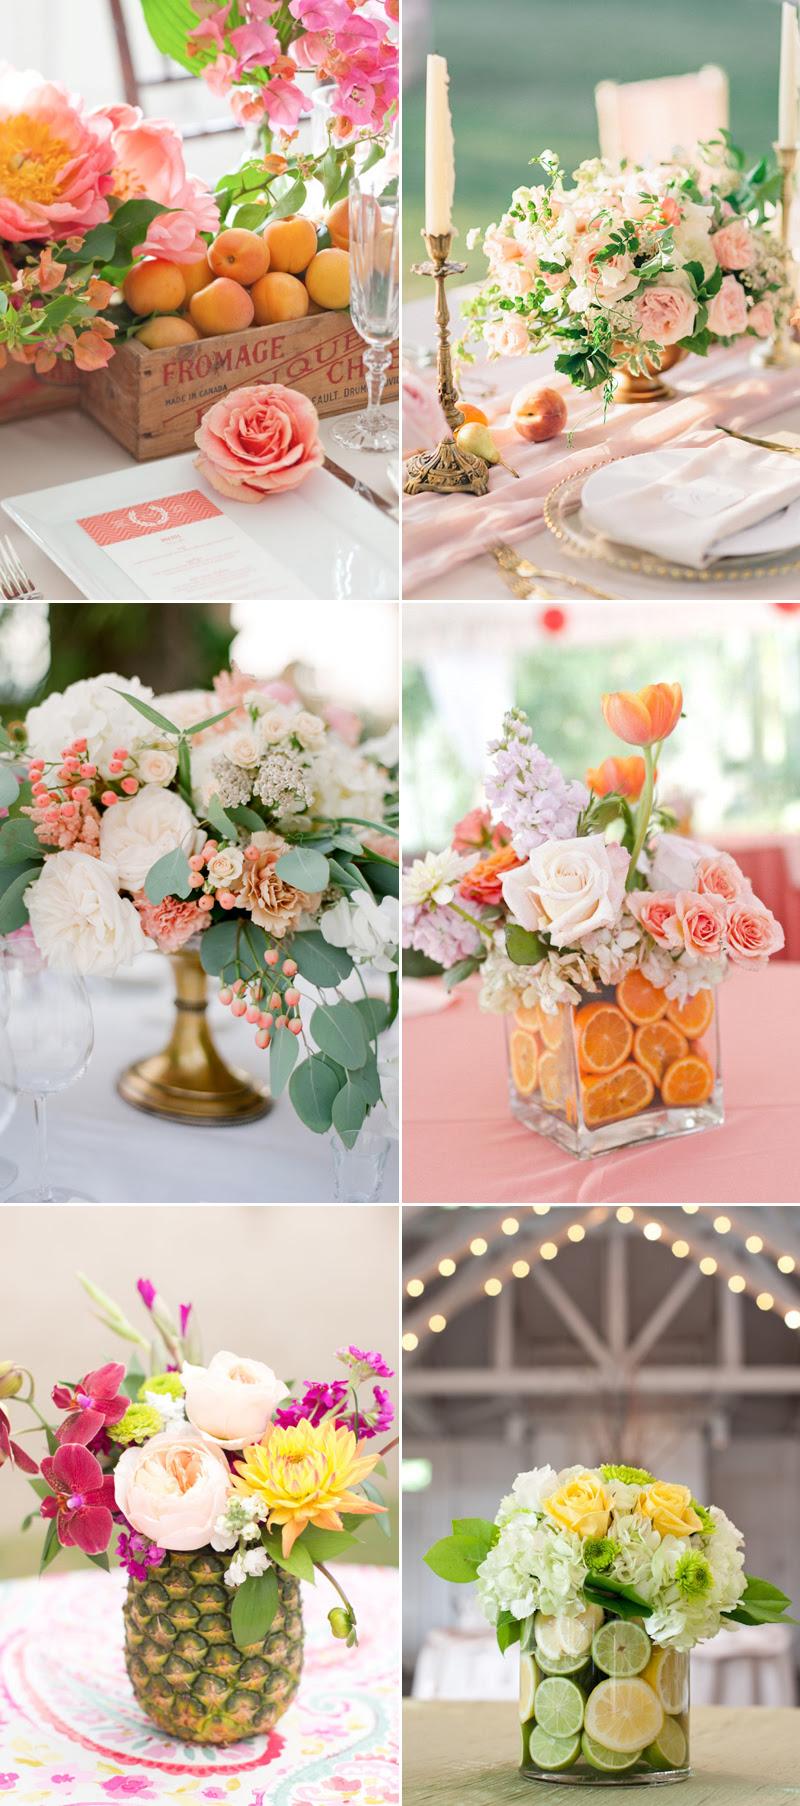 22 Romantic Fresh Flower Centerpiece Ideas For Spring Weddings Praise Wedding